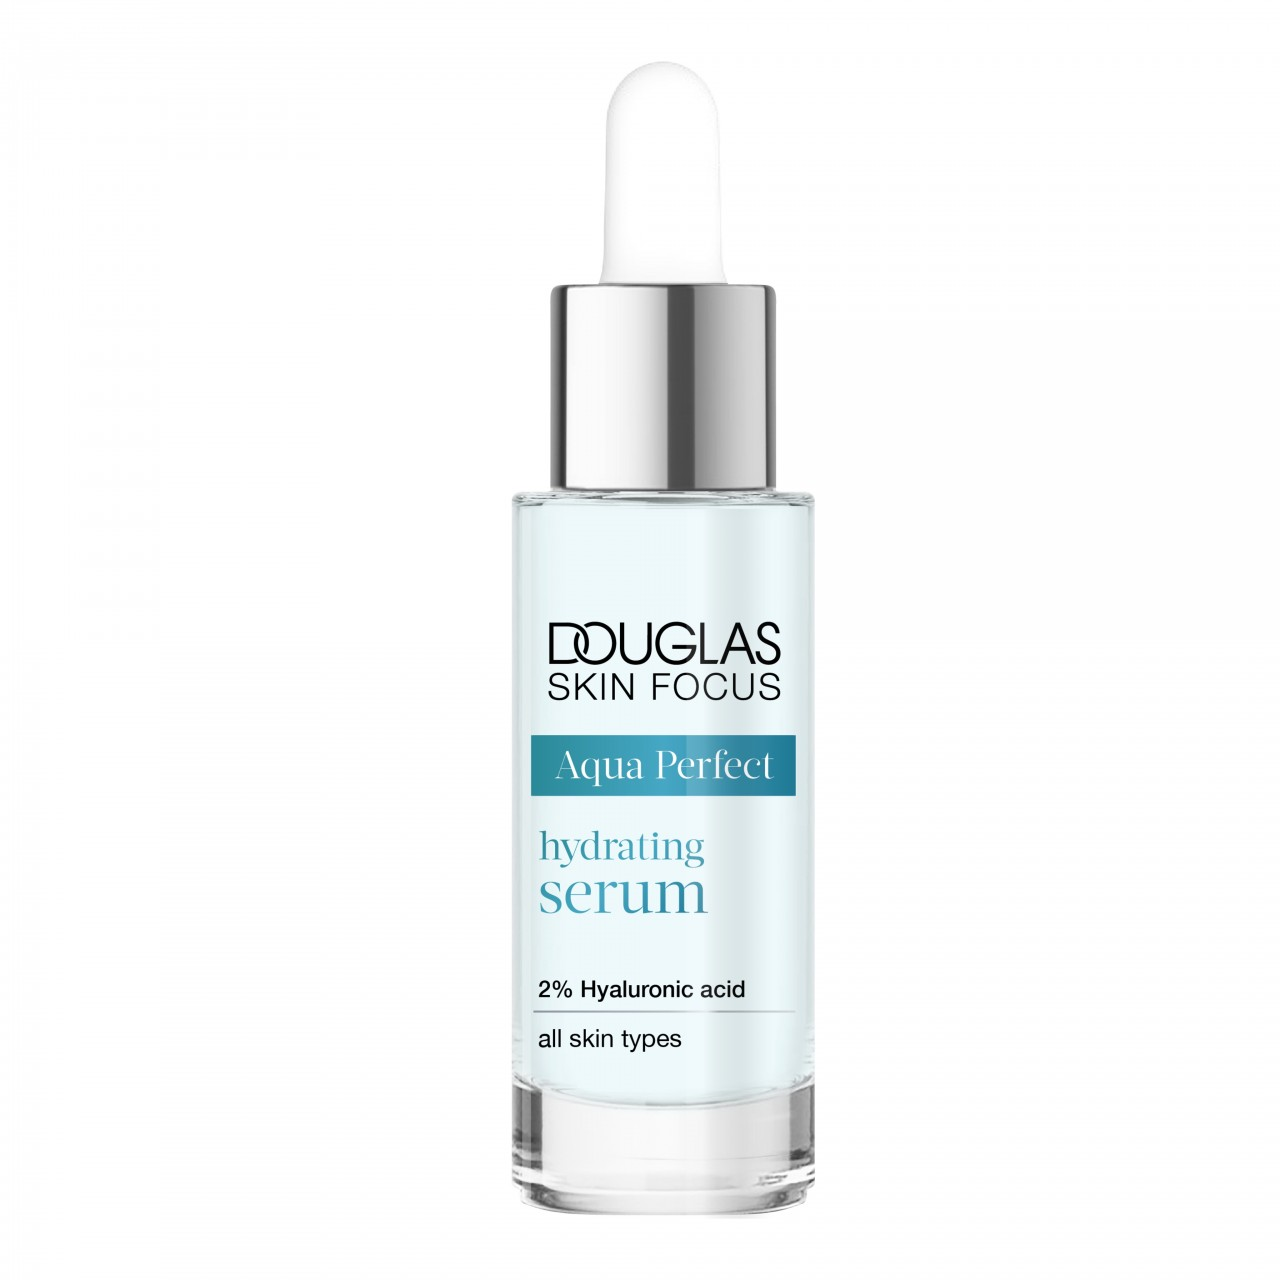 Douglas Focus Hydrating Serum